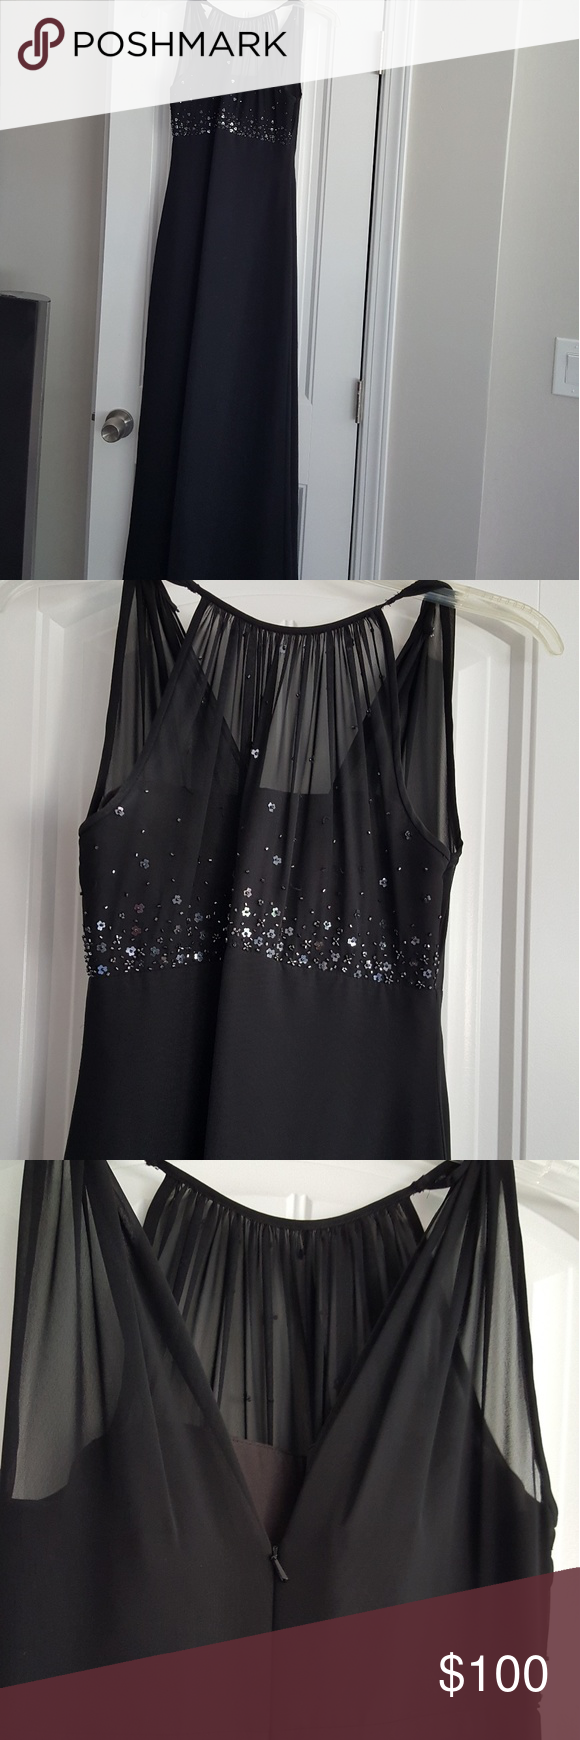 Michaelangelo wedding dress  Michael Angelo long Formal Dress Beautiful sequin sheer top